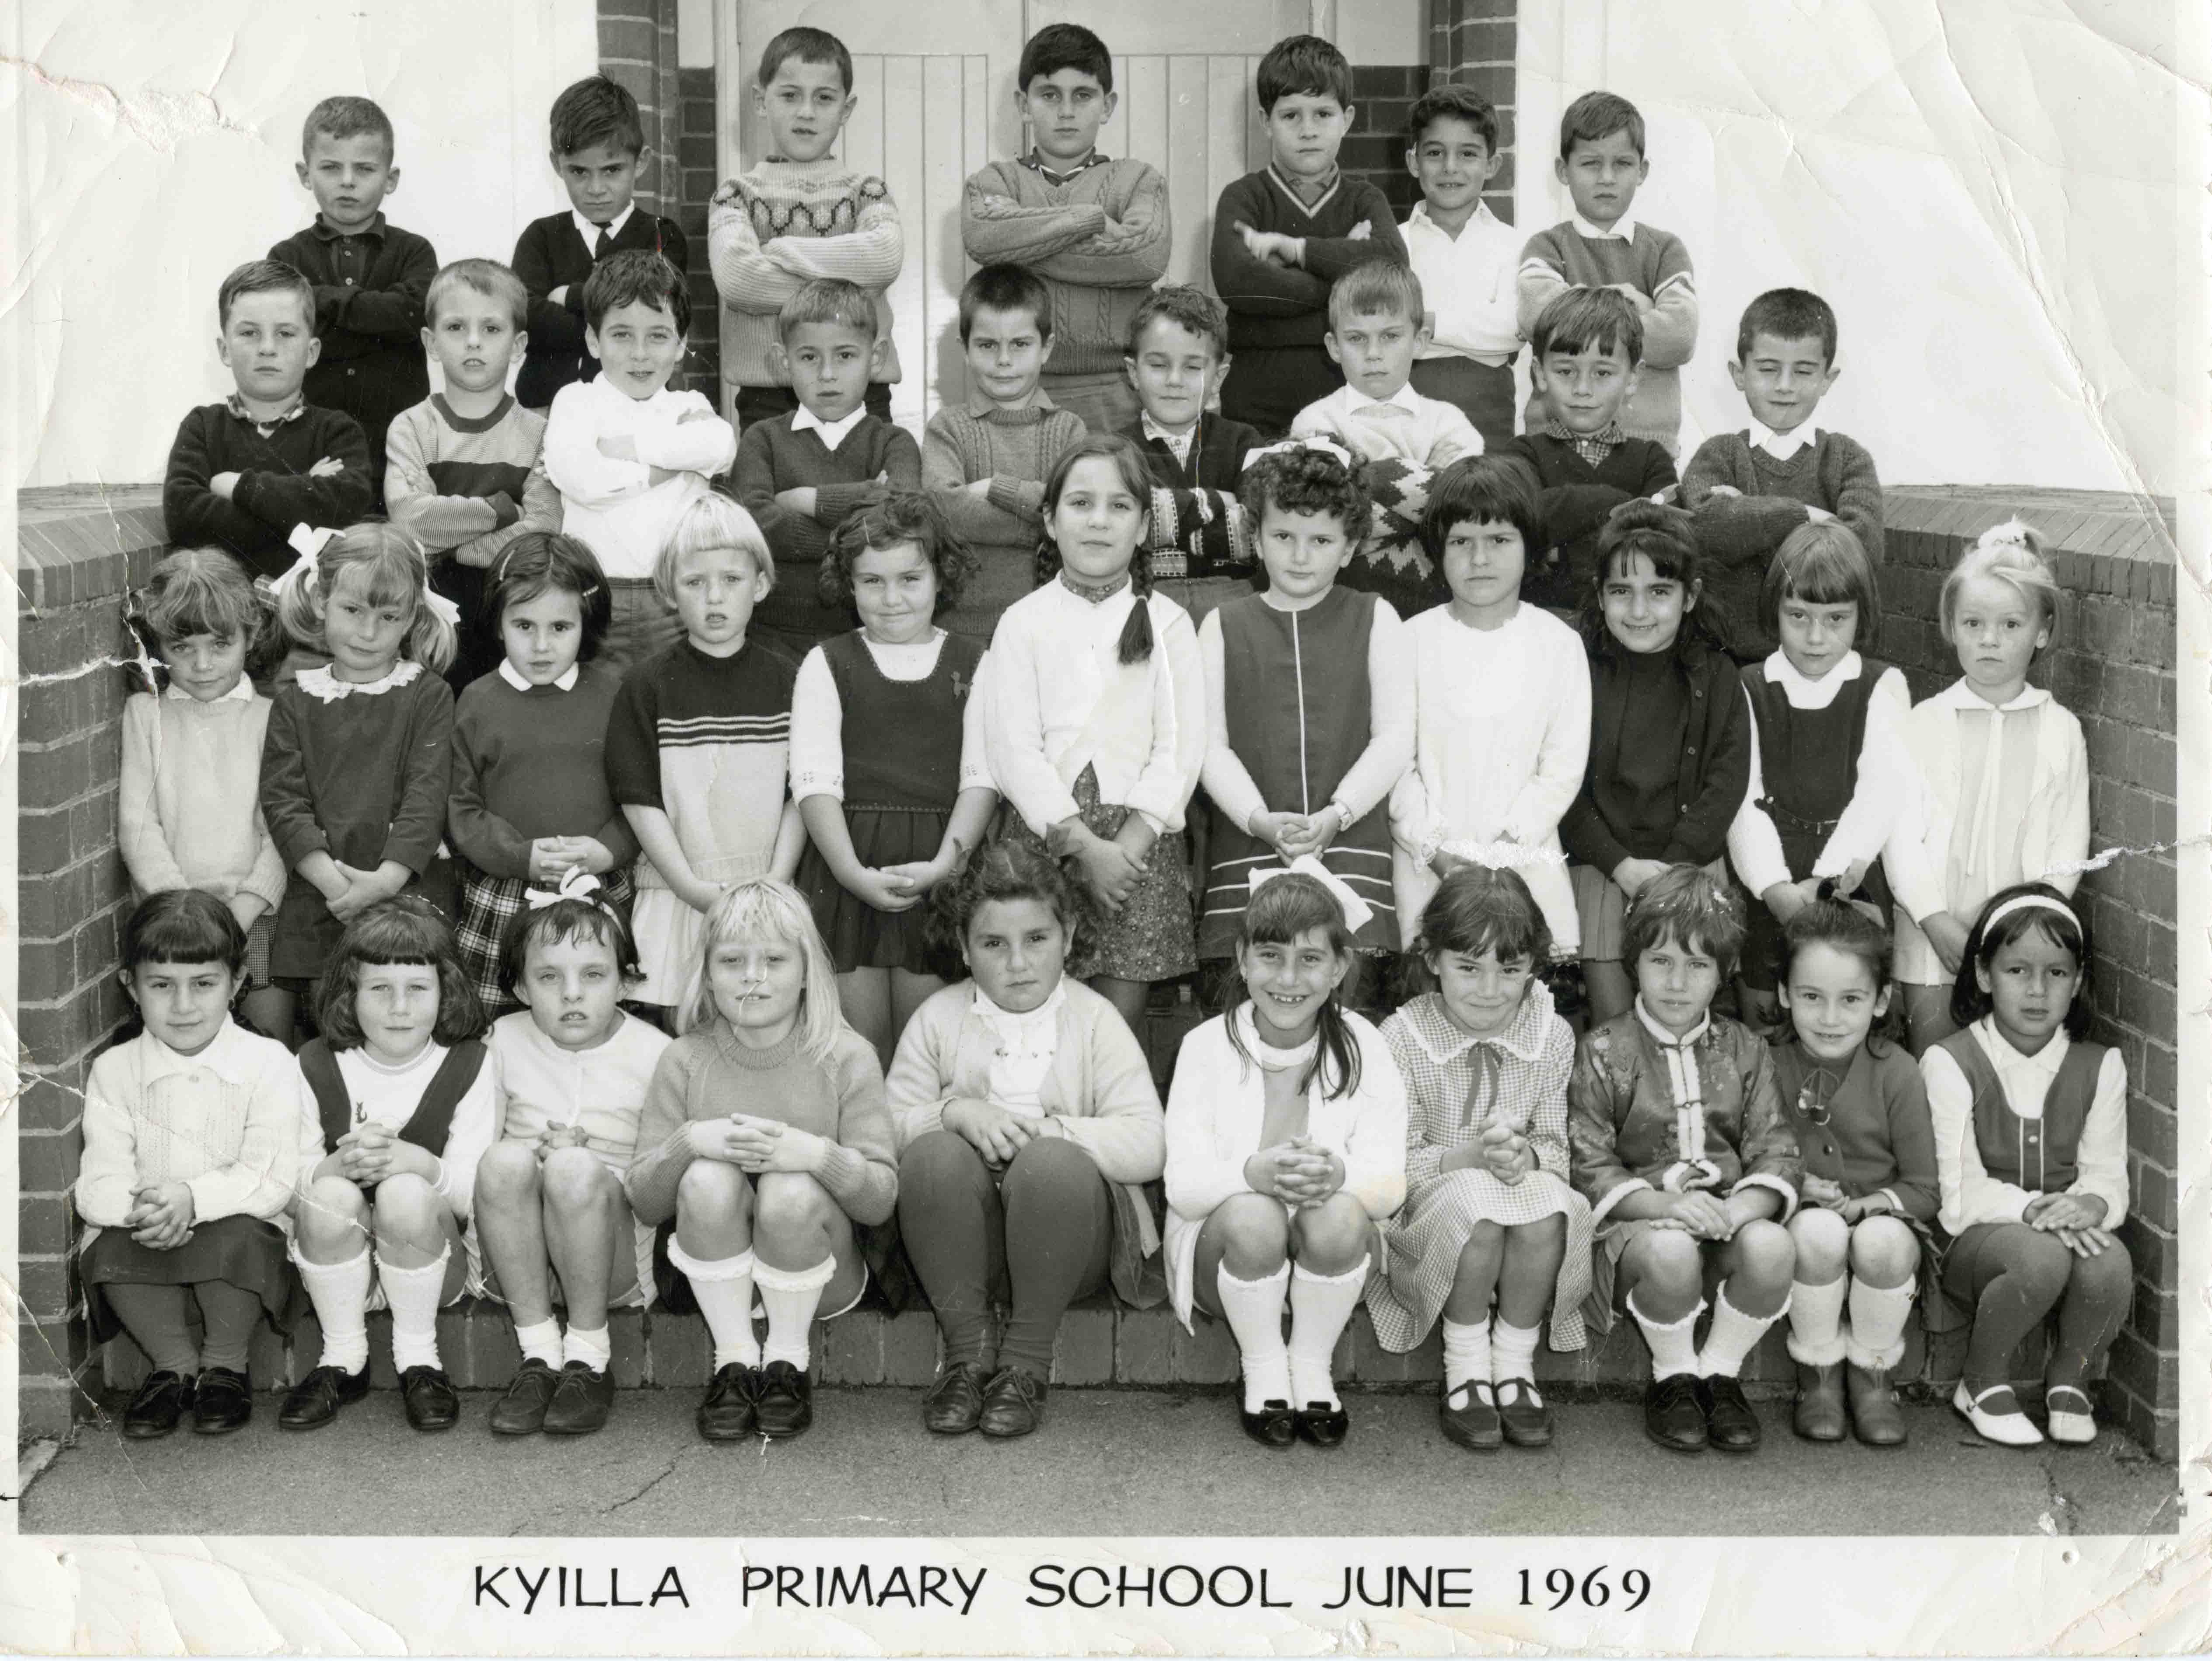 90. Kyilla Primary School 1969